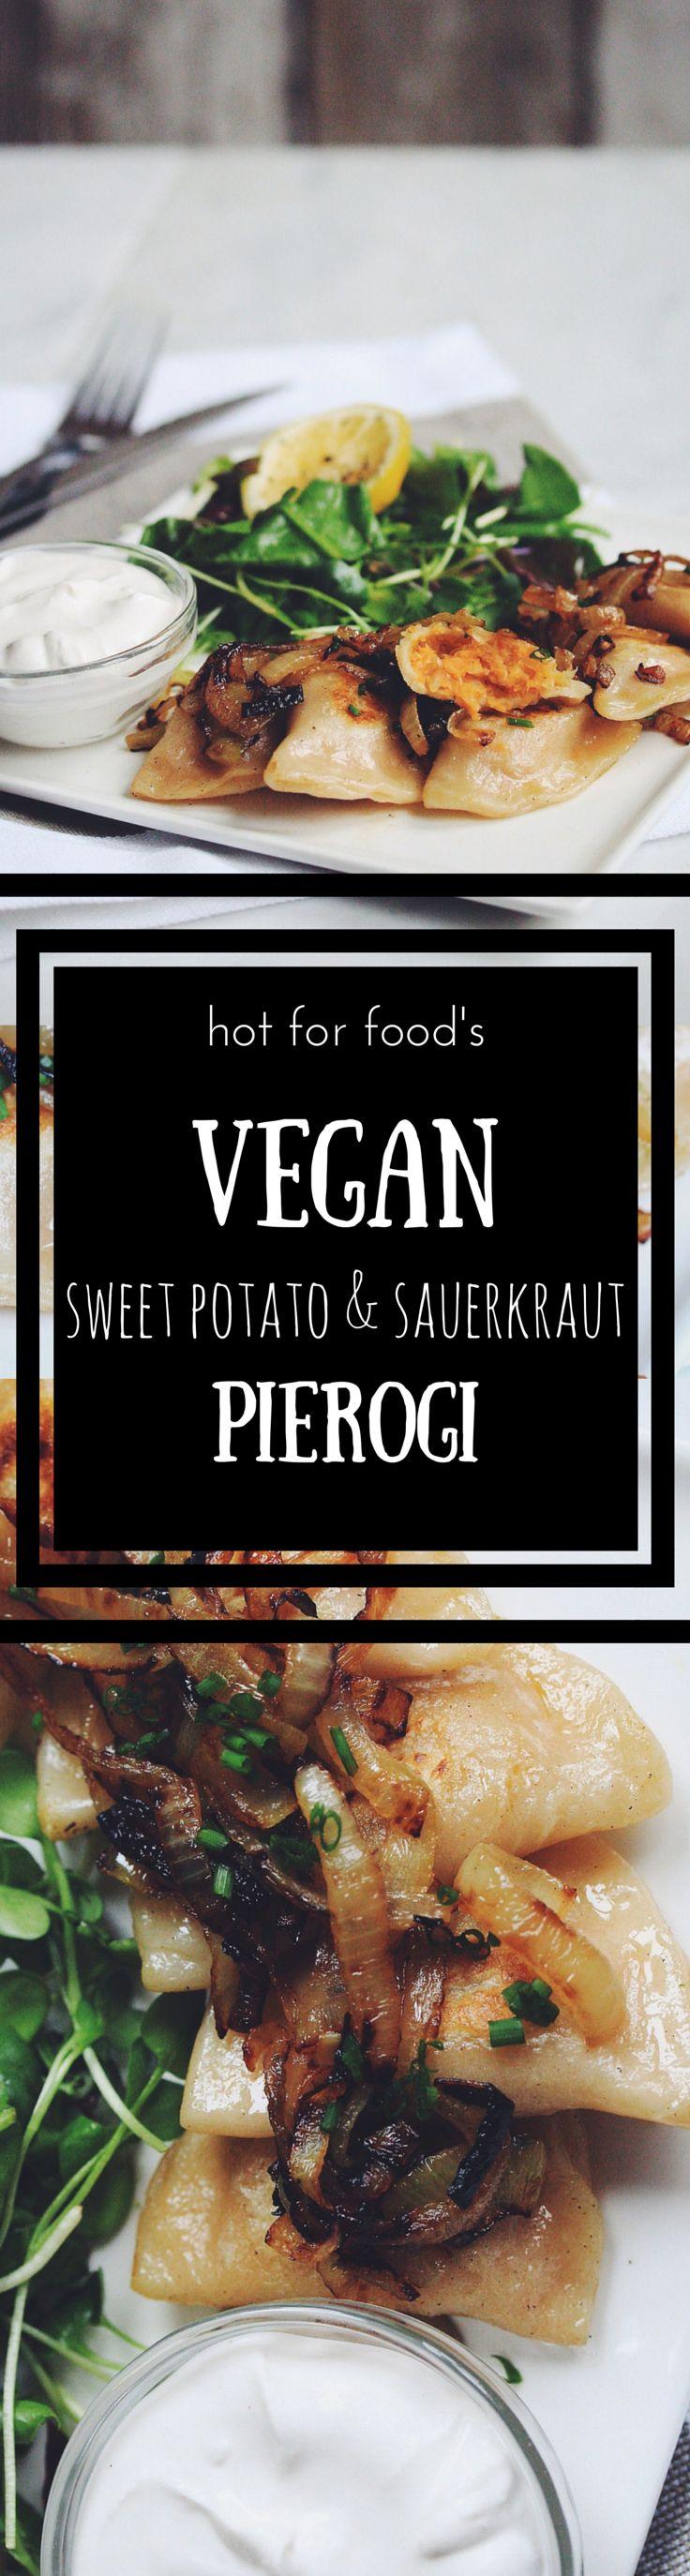 vegan sweet potato and sauerkraut pierogi | RECIPE on hotforfoodblog.com